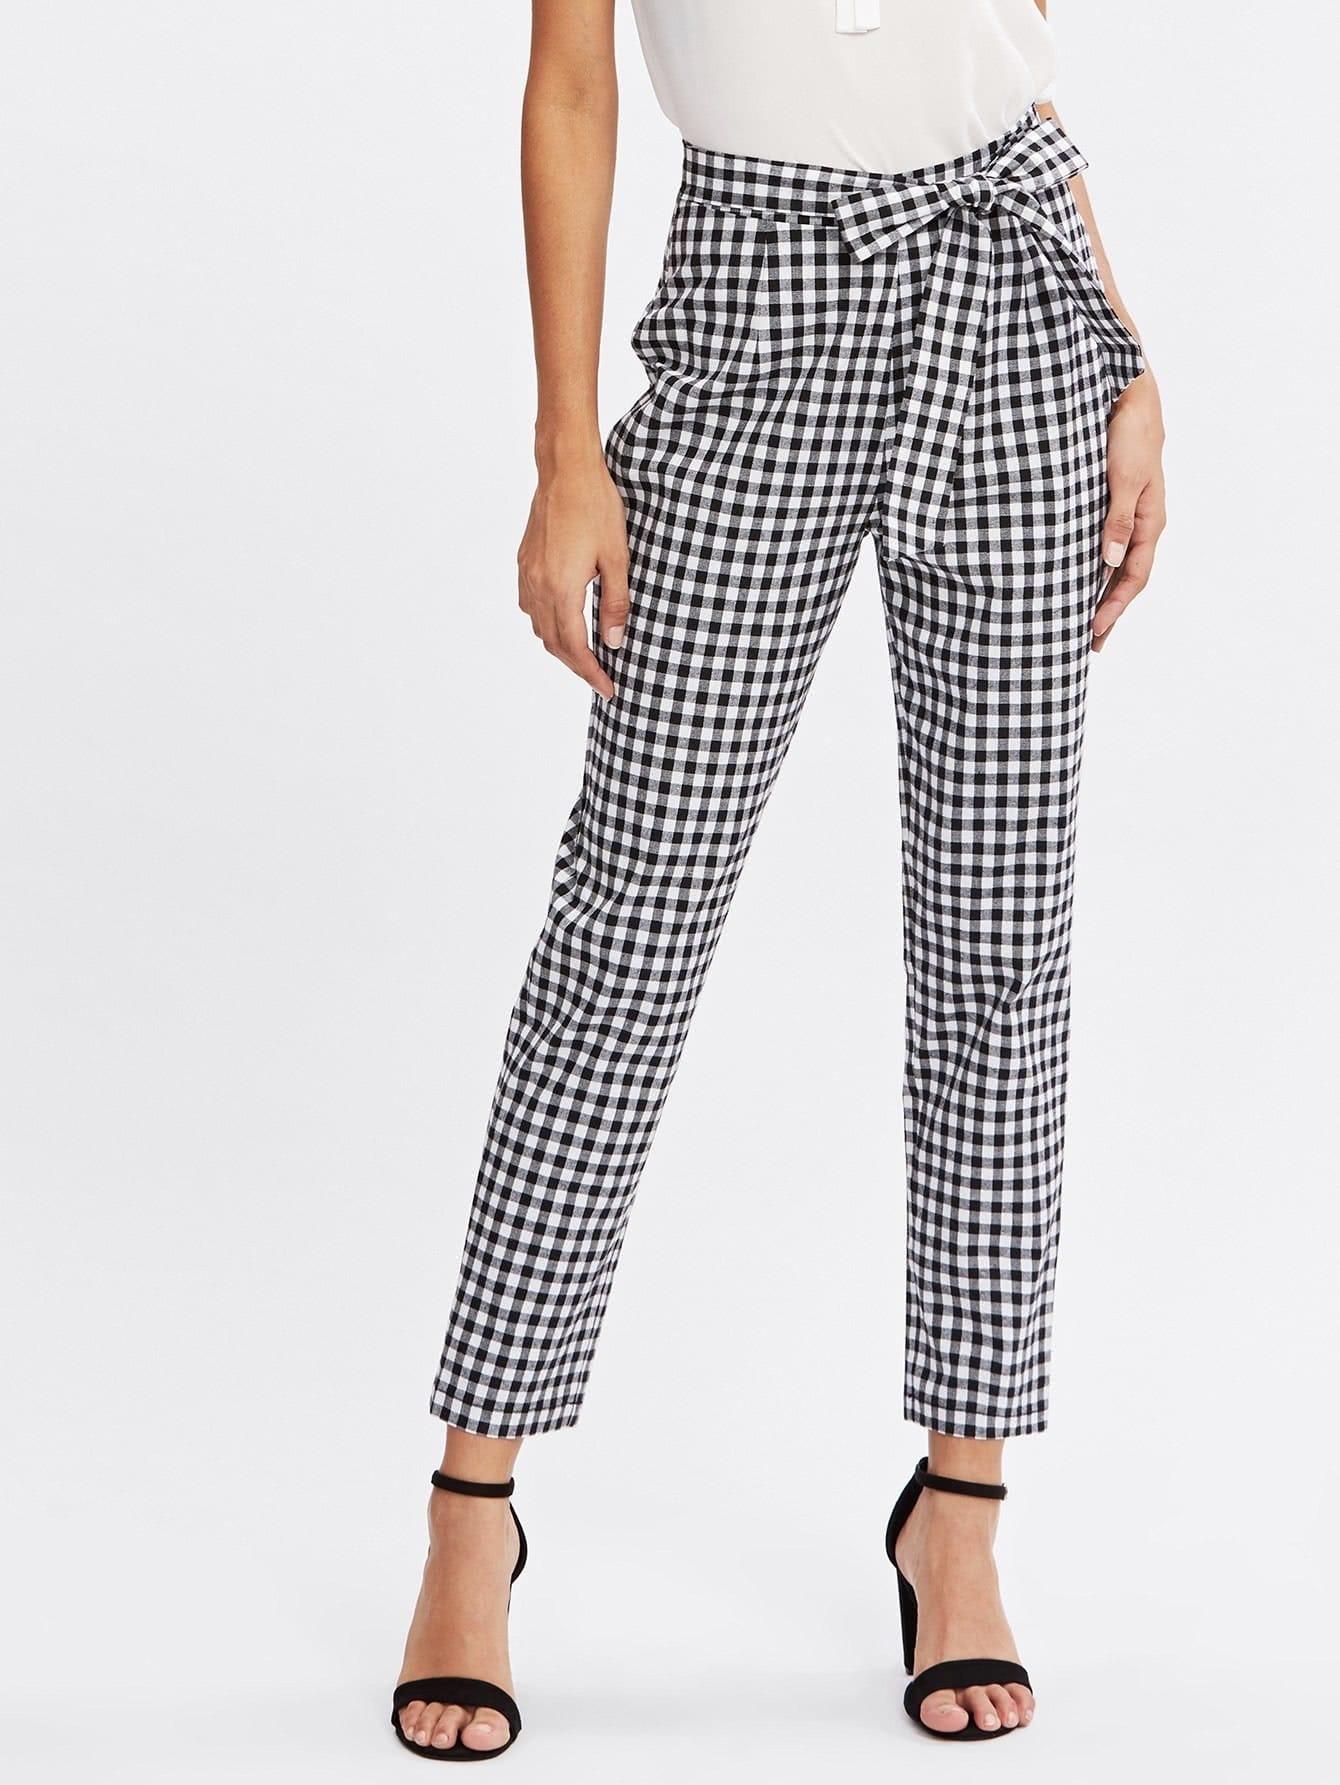 Checkered Bow Tie Waist Smoking Pants dark grey tie waist sports pants